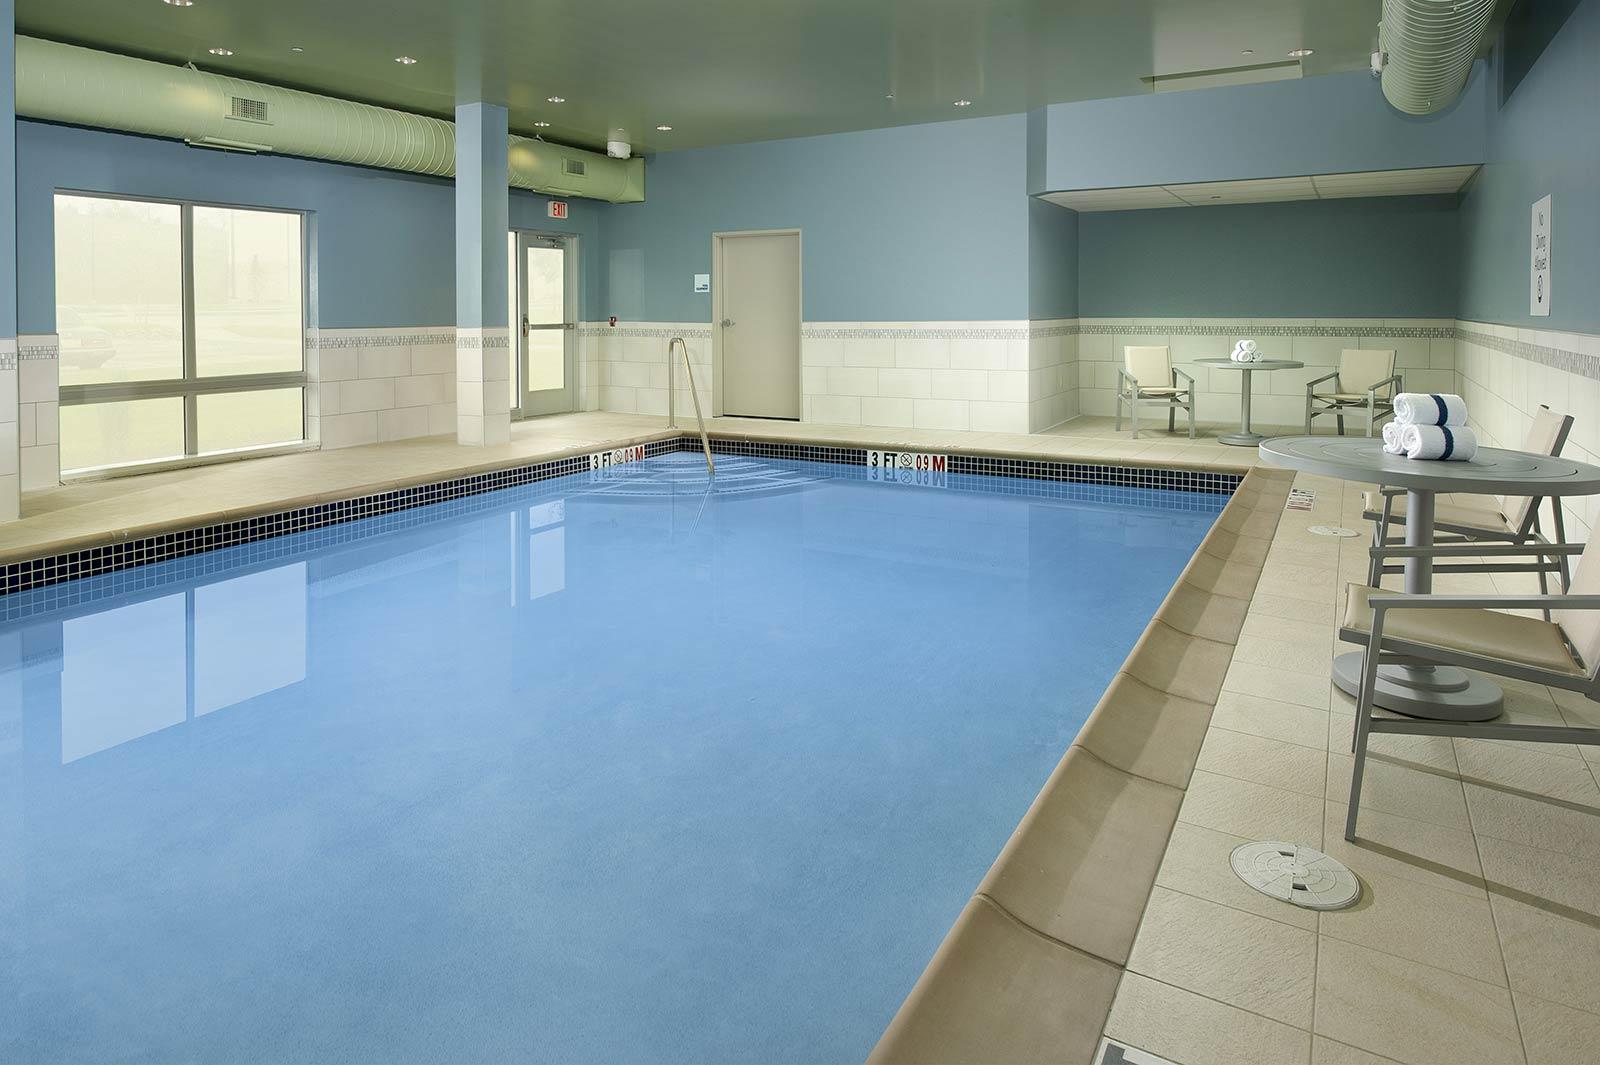 Altoona, PA Hotel Photo Gallery – Photos of the Holiday Inn Express ...